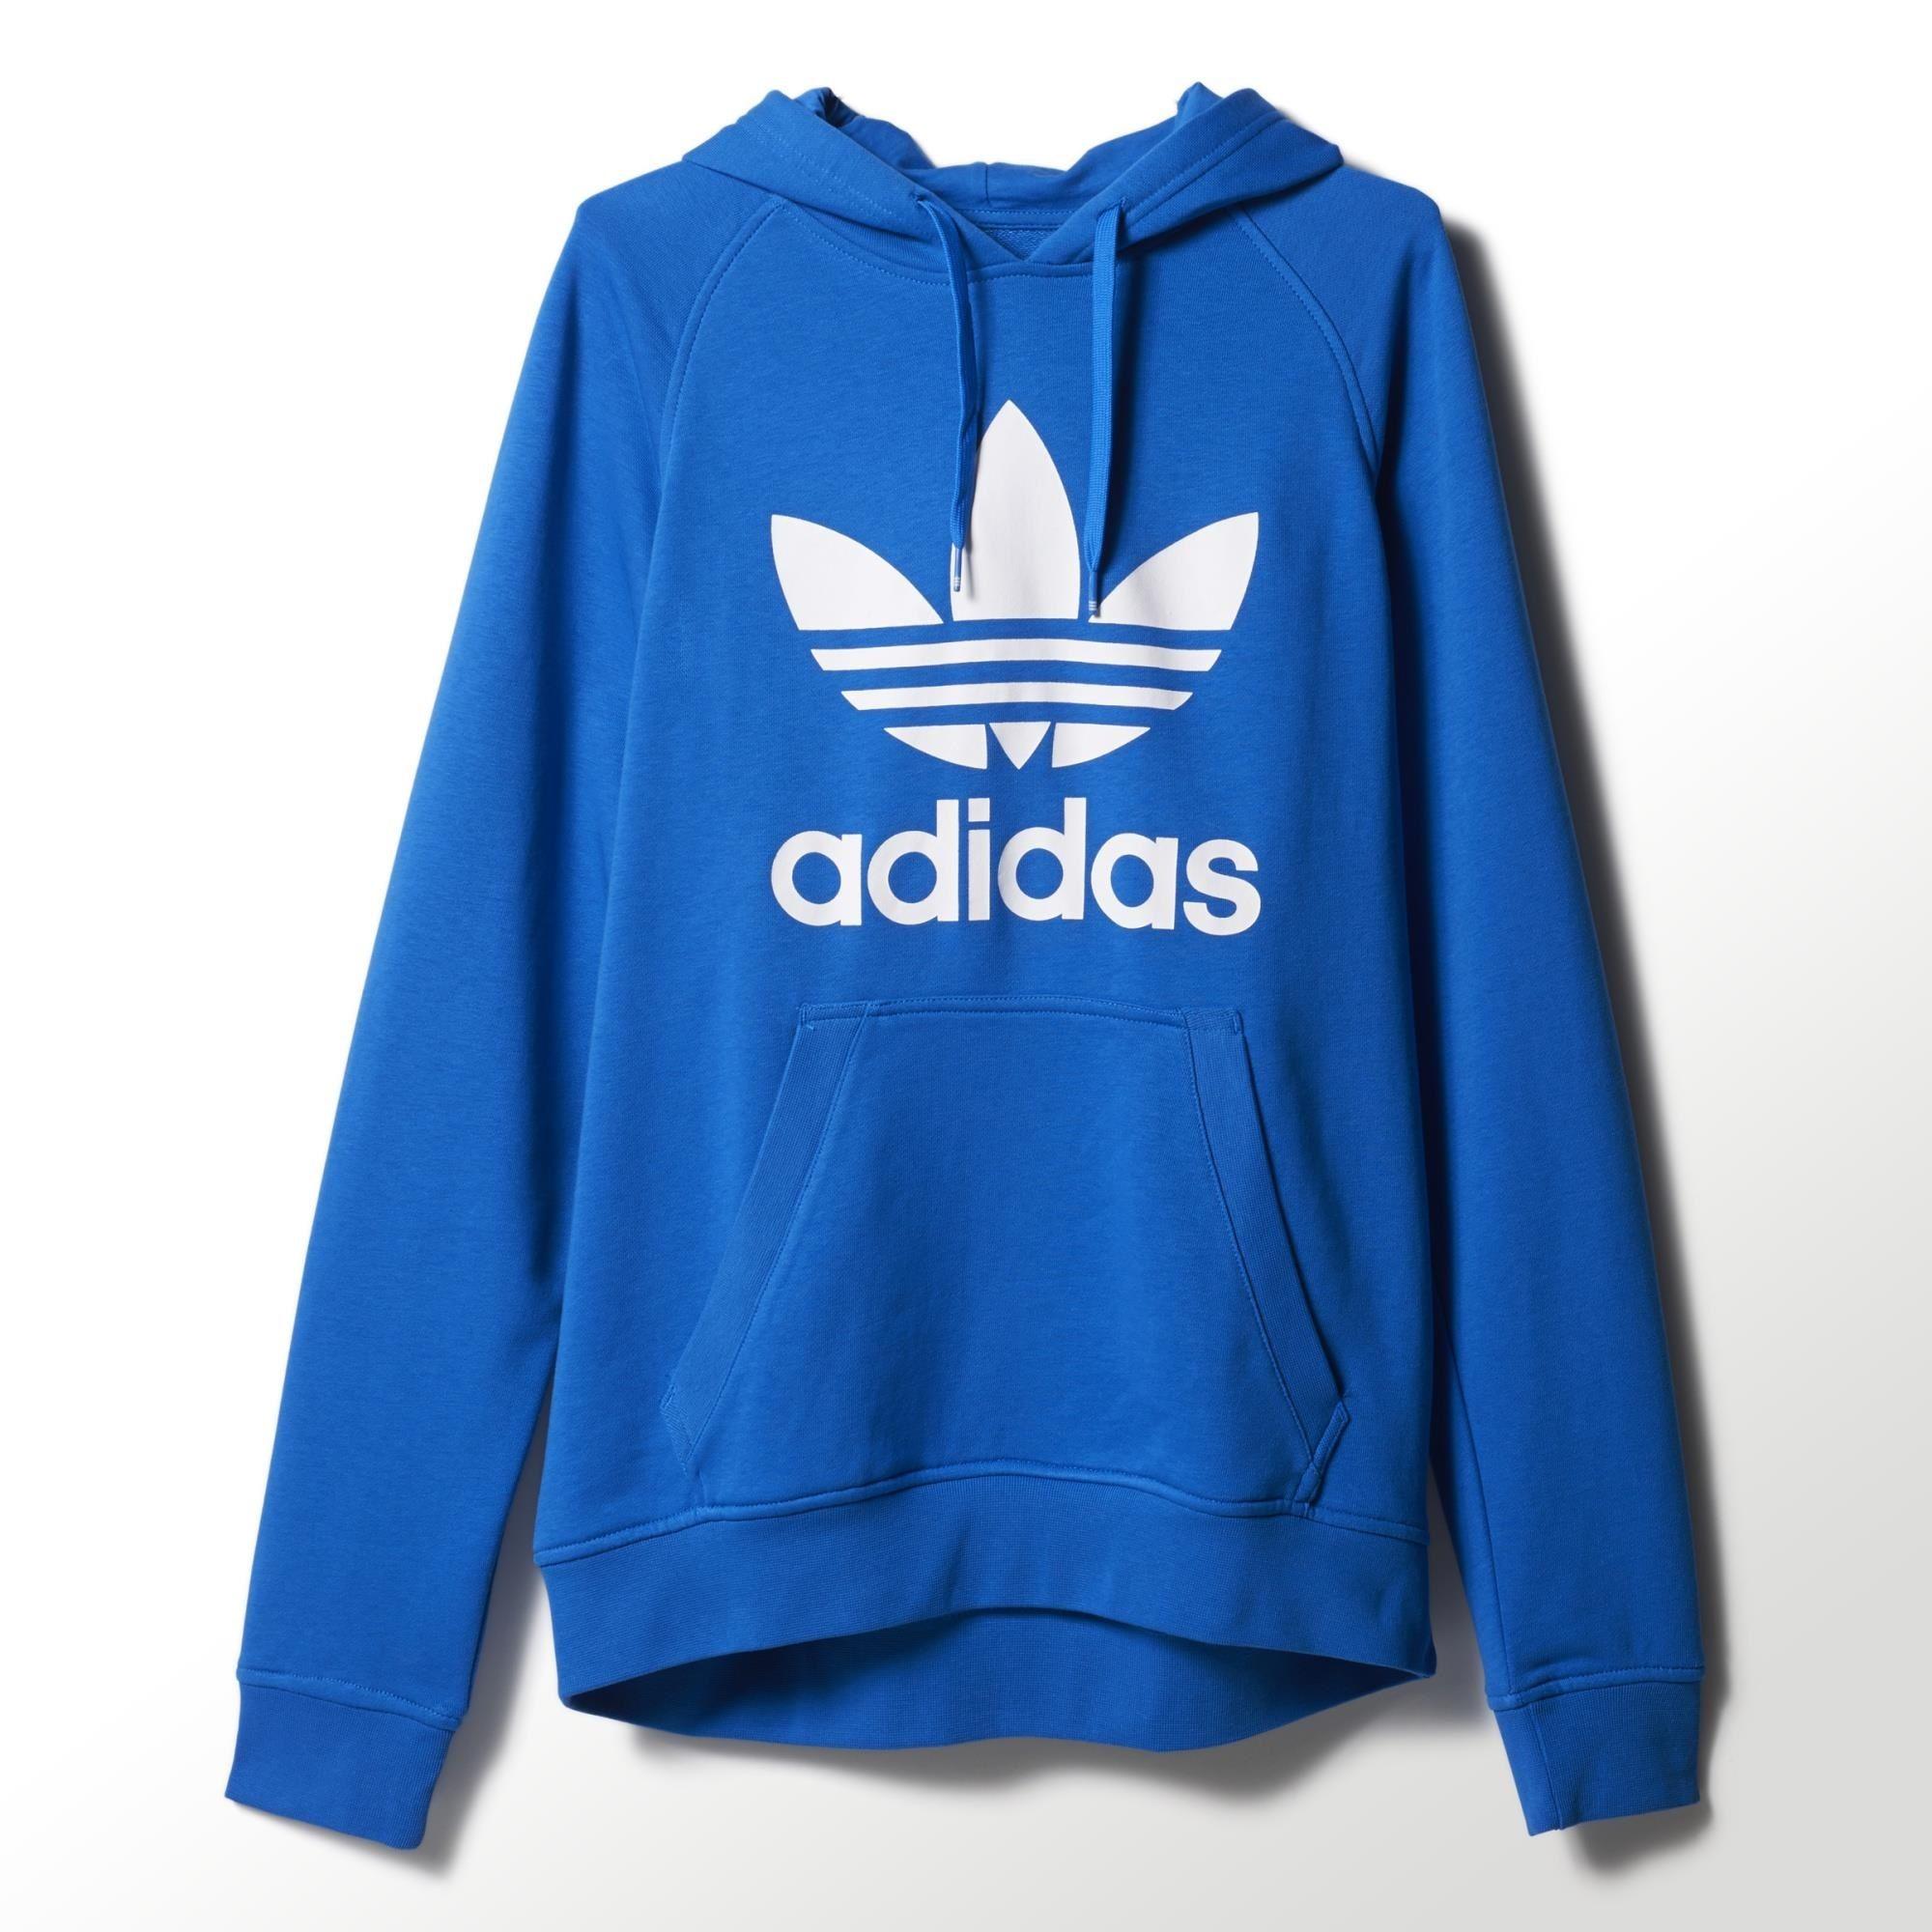 Originals Adidas Adidas Sudadera Originals Trefoilazulblanco CdoWQxerB